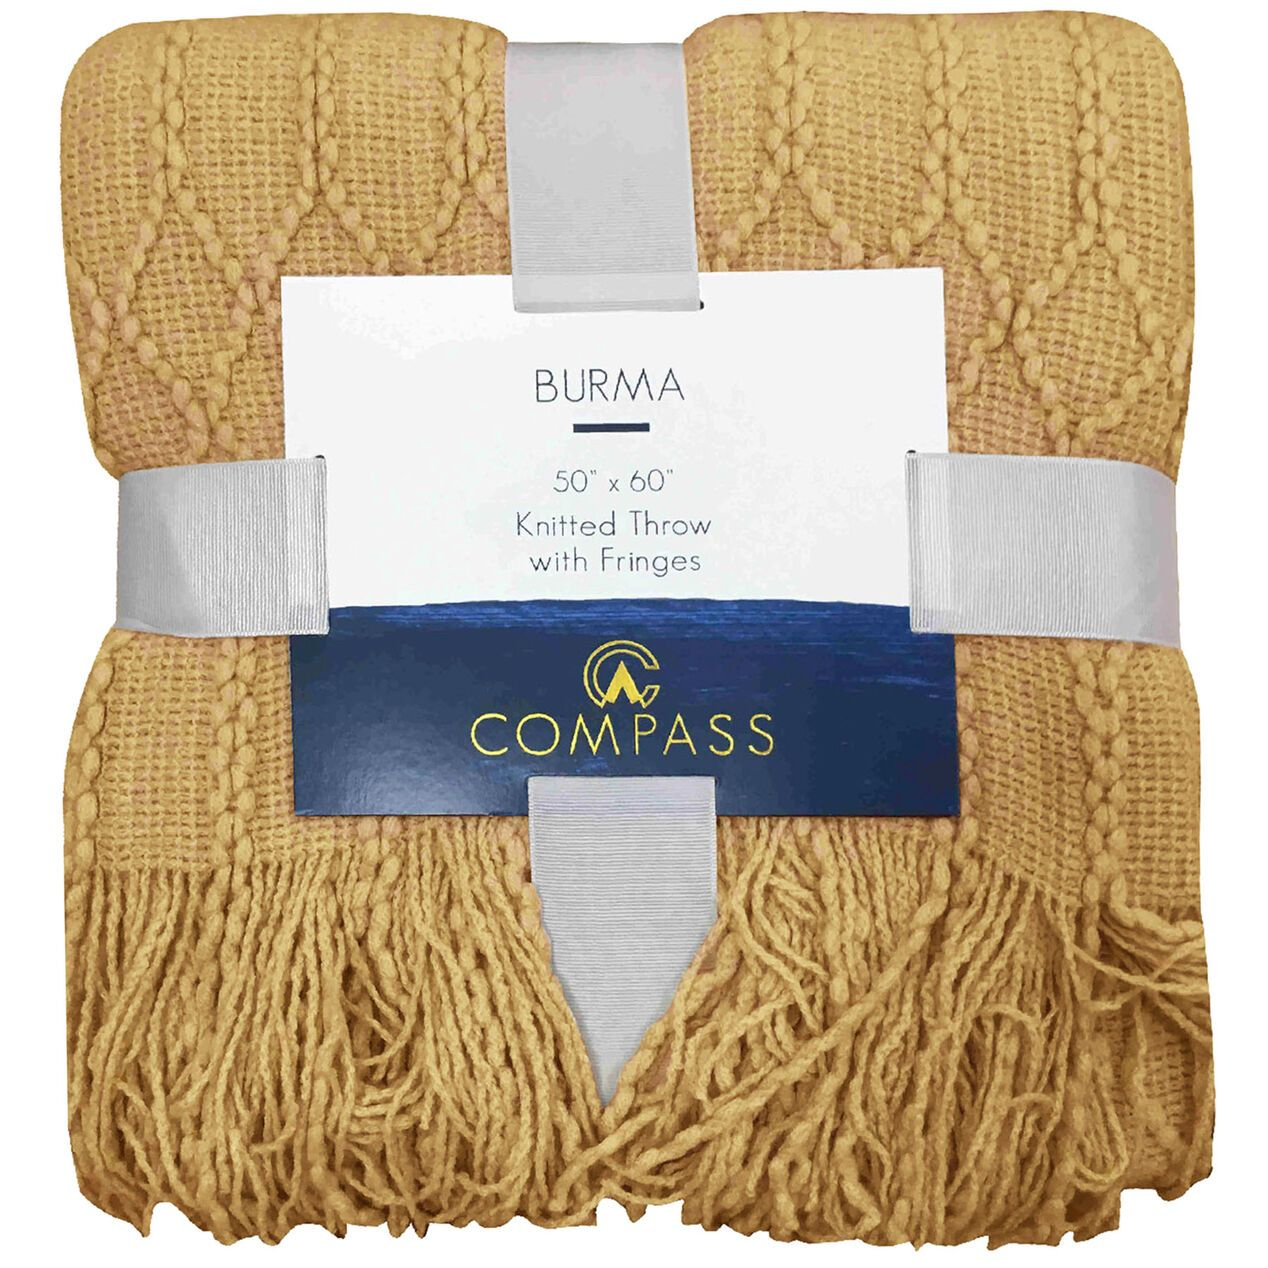 Burma Knitted Mustard Throw Blanket Mustard Throw Blanket Knitted Throws Affordable Throw Blankets